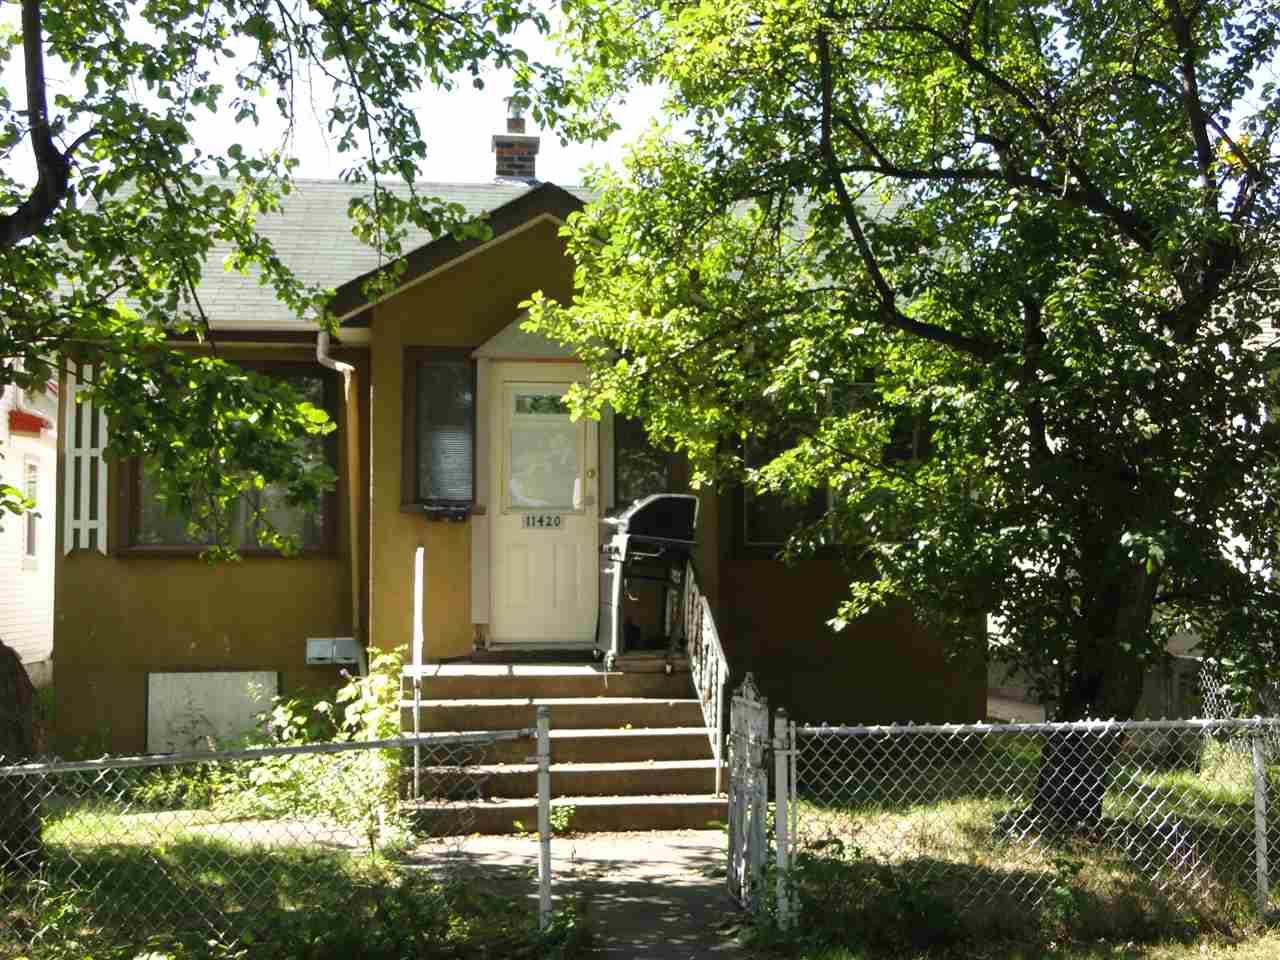 11420 88 Street, 3 bed, 1 bath, at $224,900